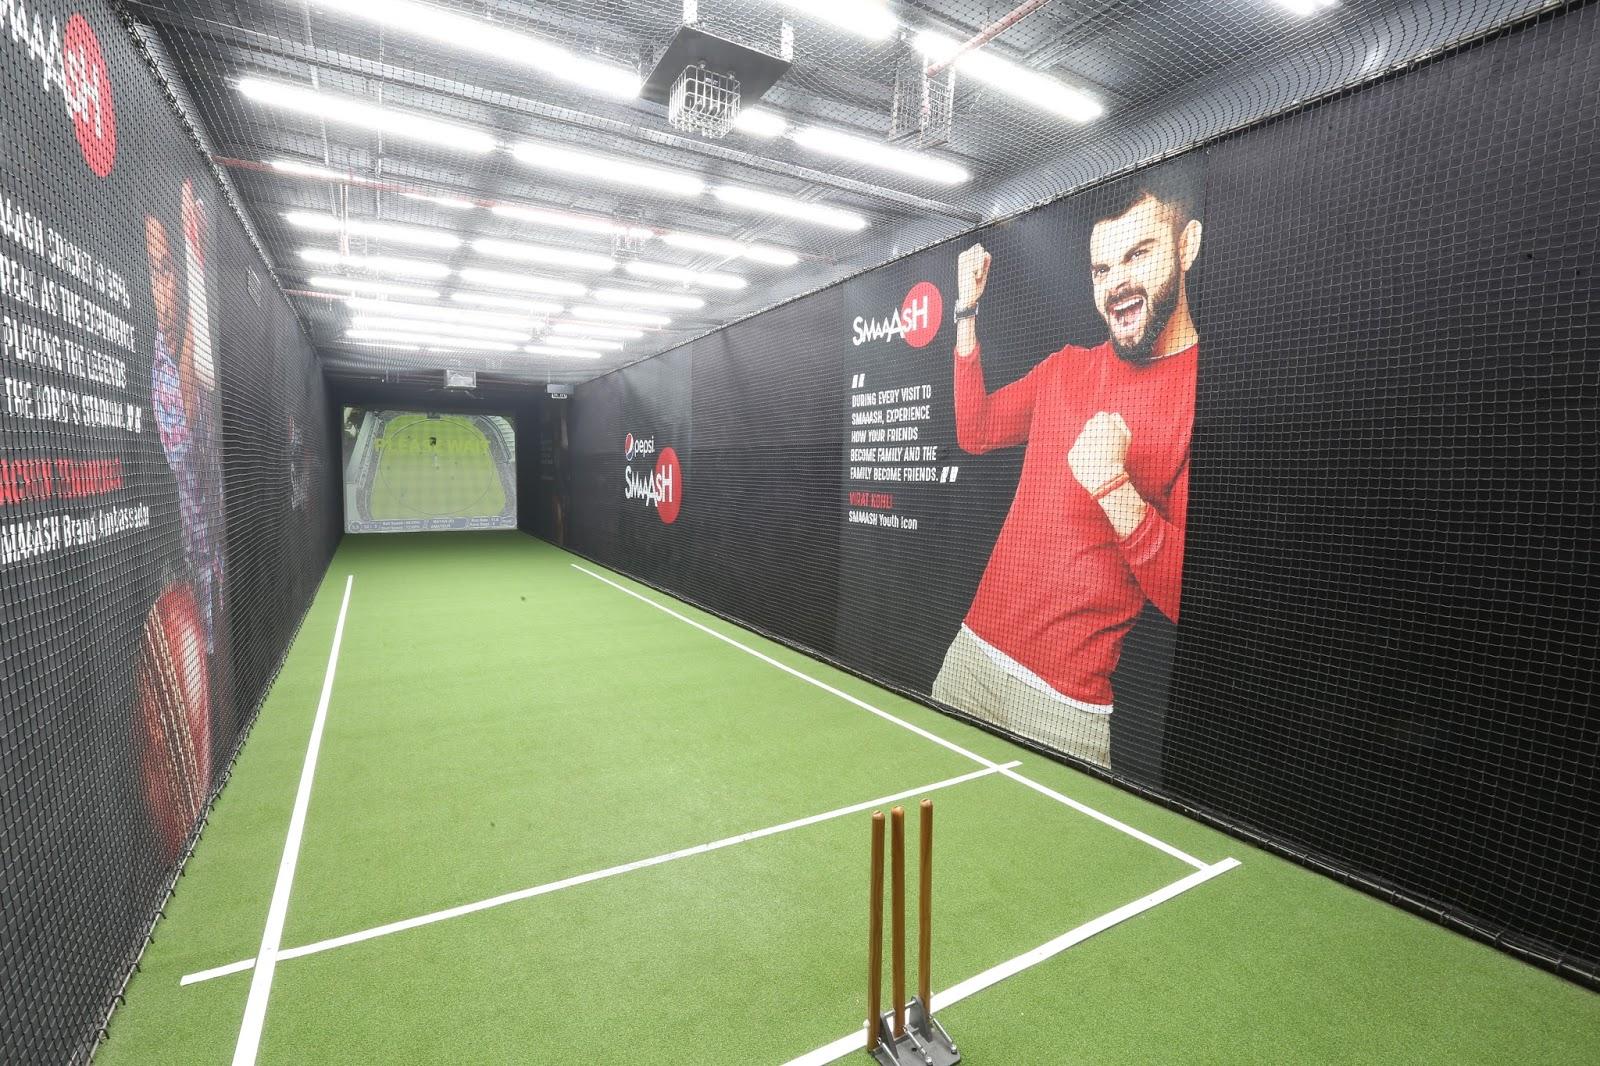 Legends Sports Cafe Eufaula Al Menu